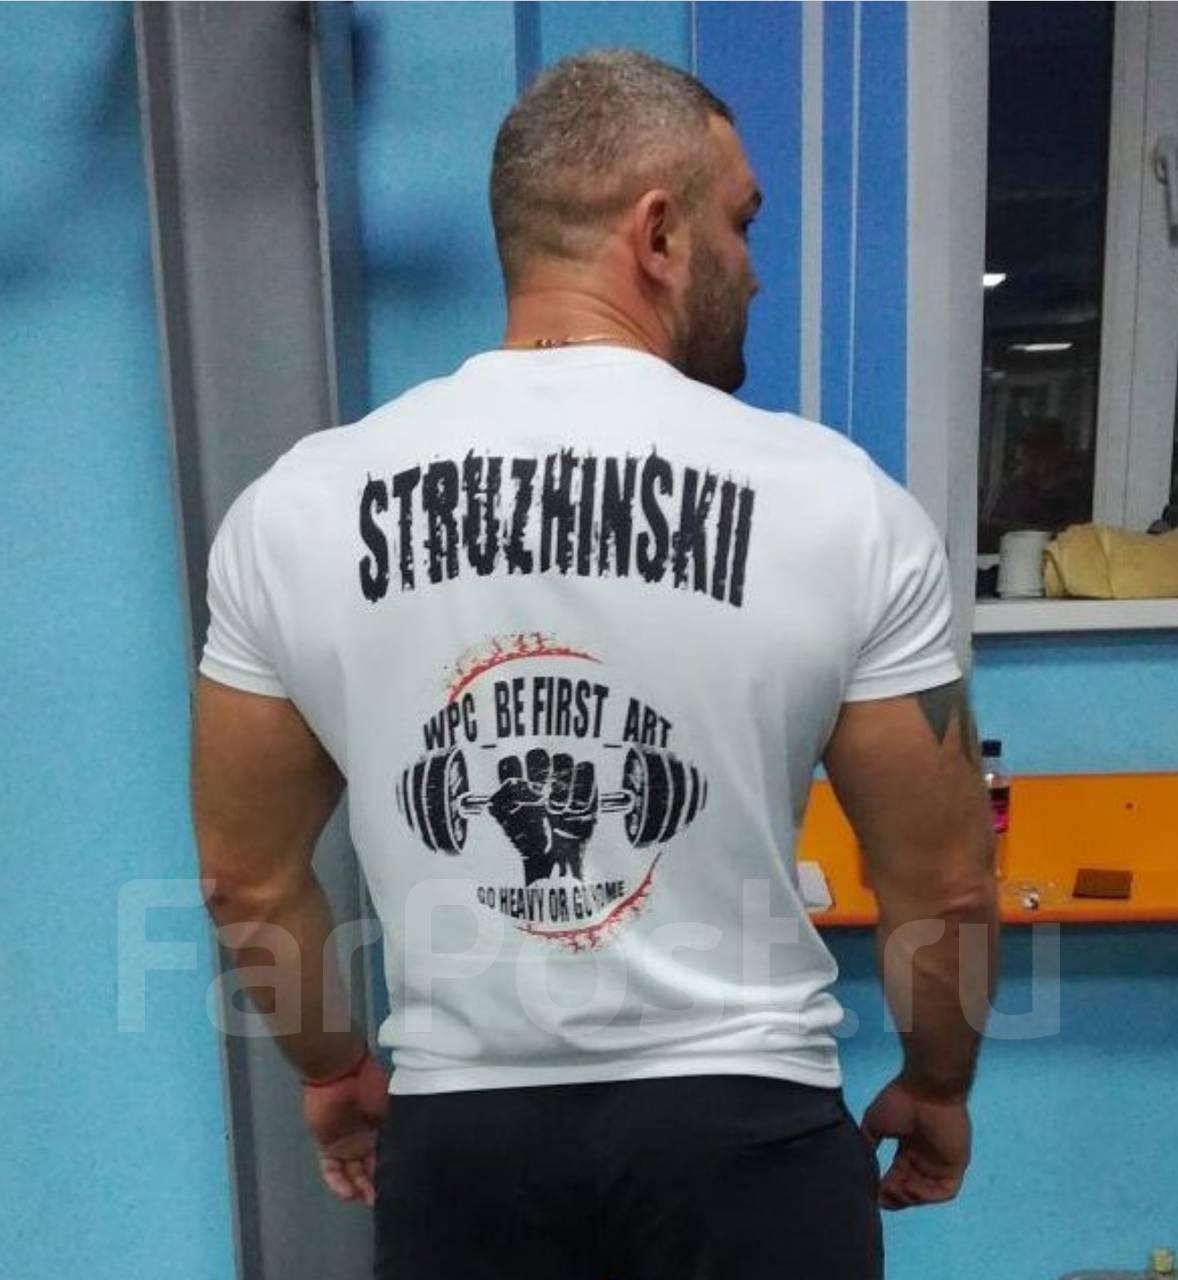 e1438a6d700f3 Мужская спортивная одежда в Приморском крае